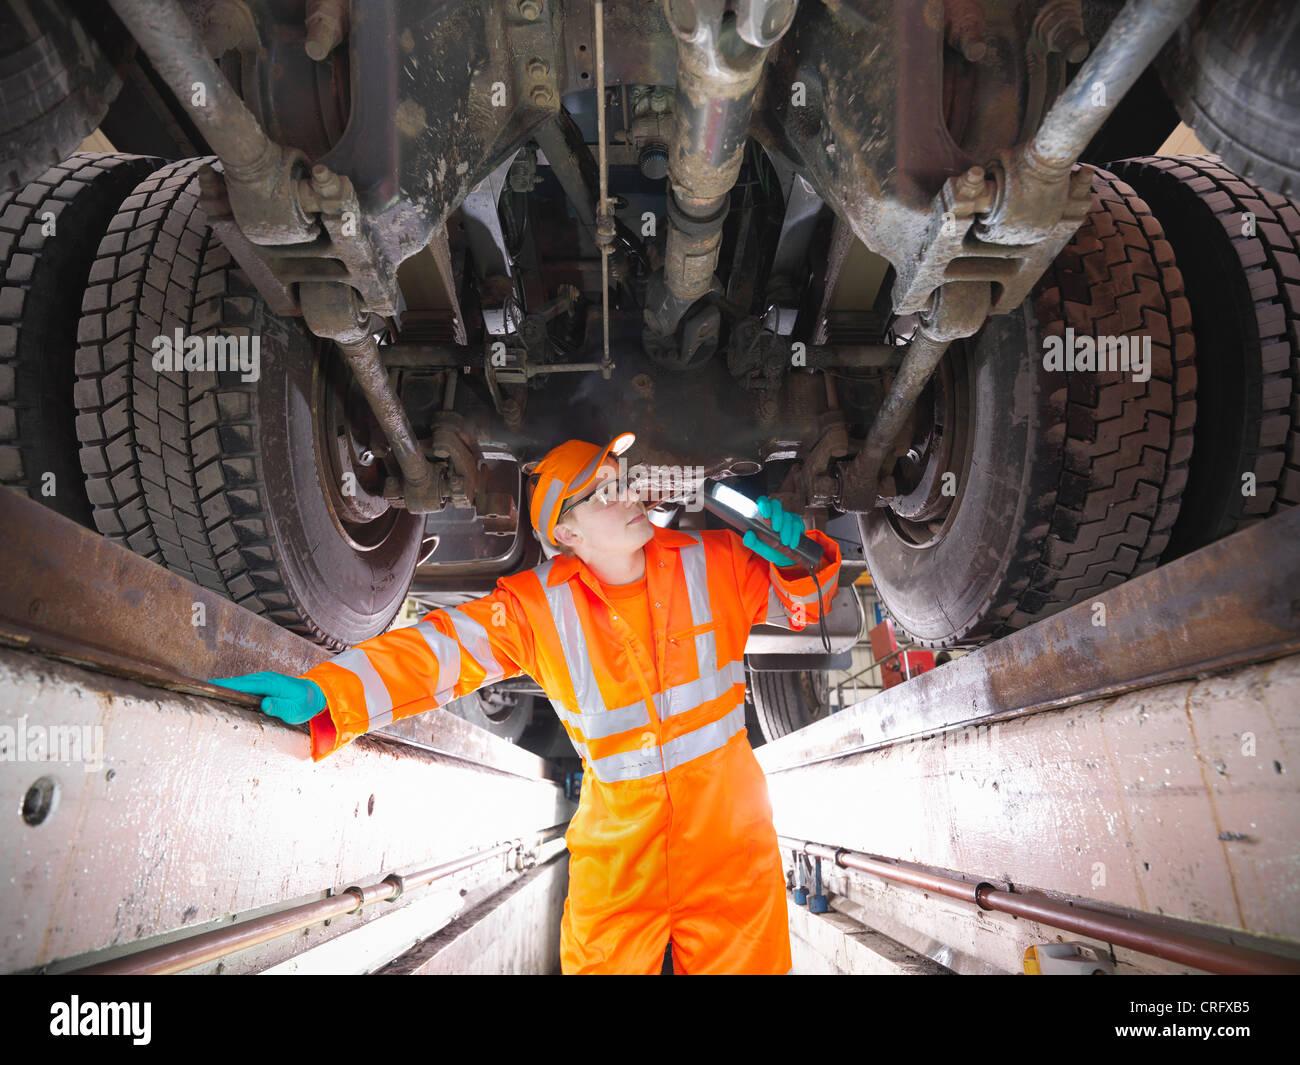 Ingeniero Aprendiz examinar el motor Imagen De Stock